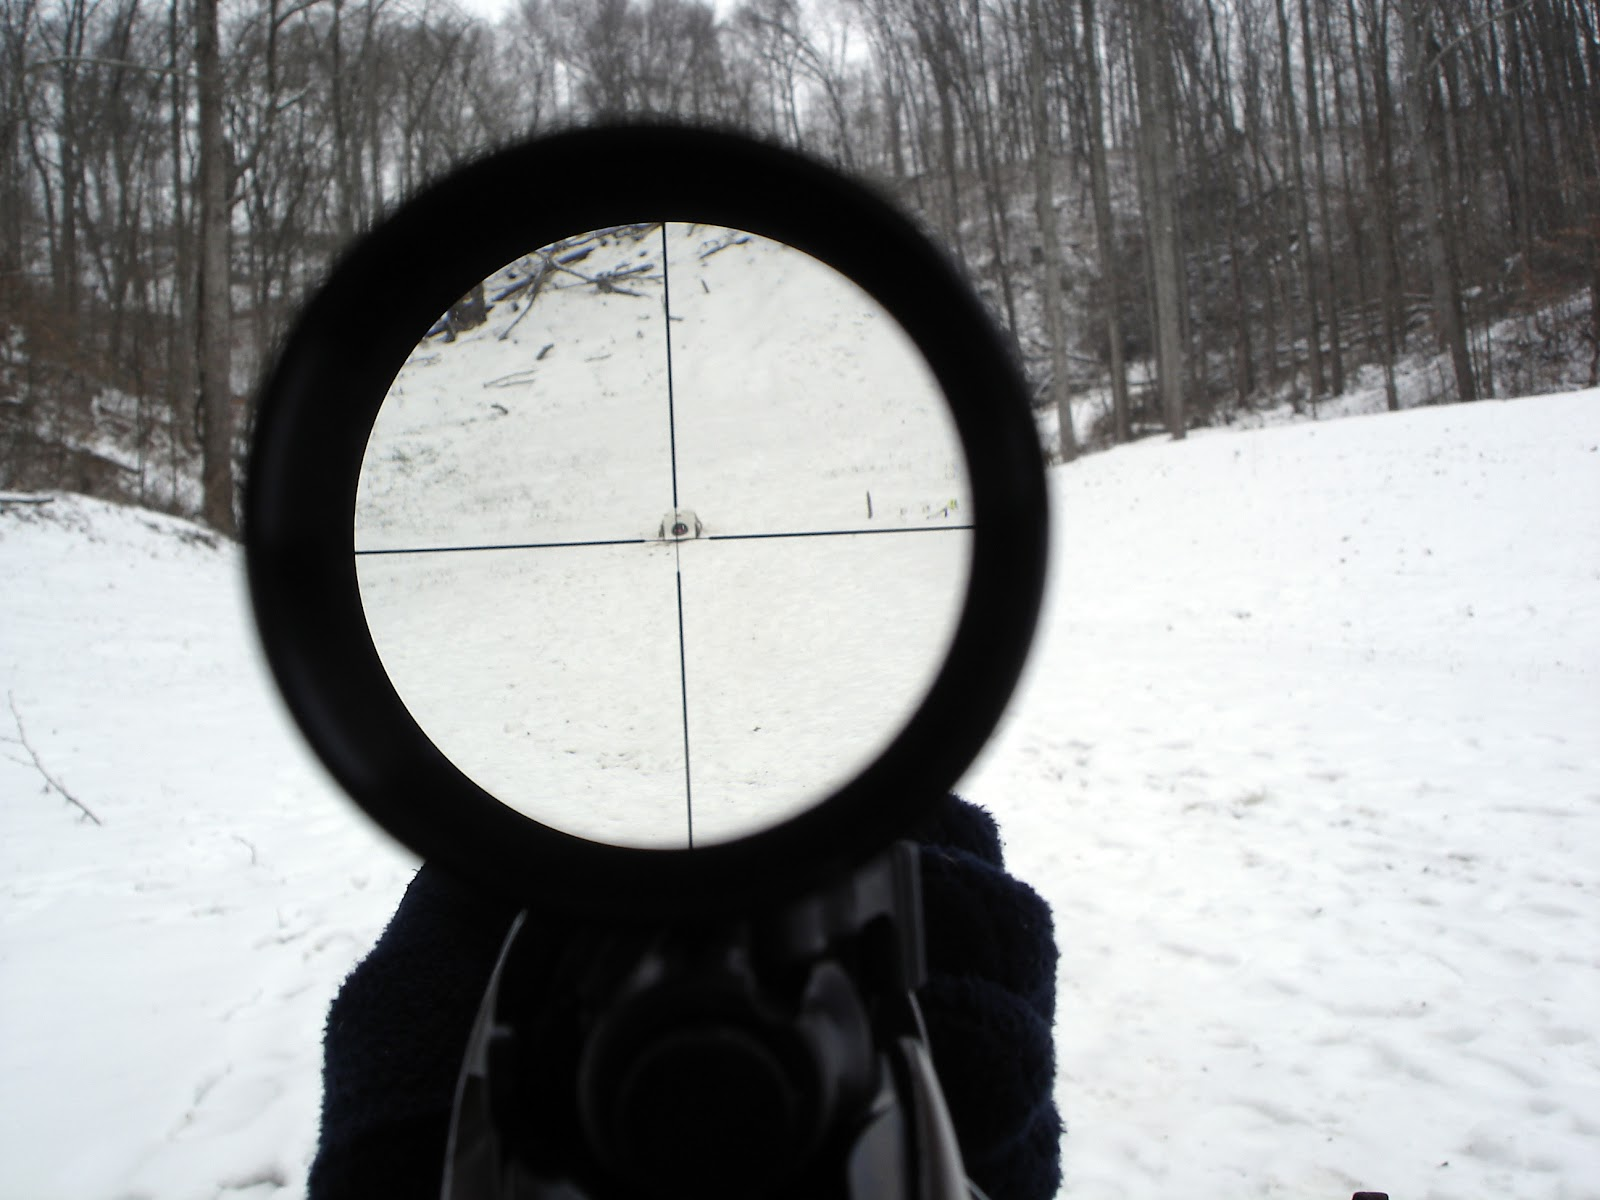 File:4x rifle scope.jpg